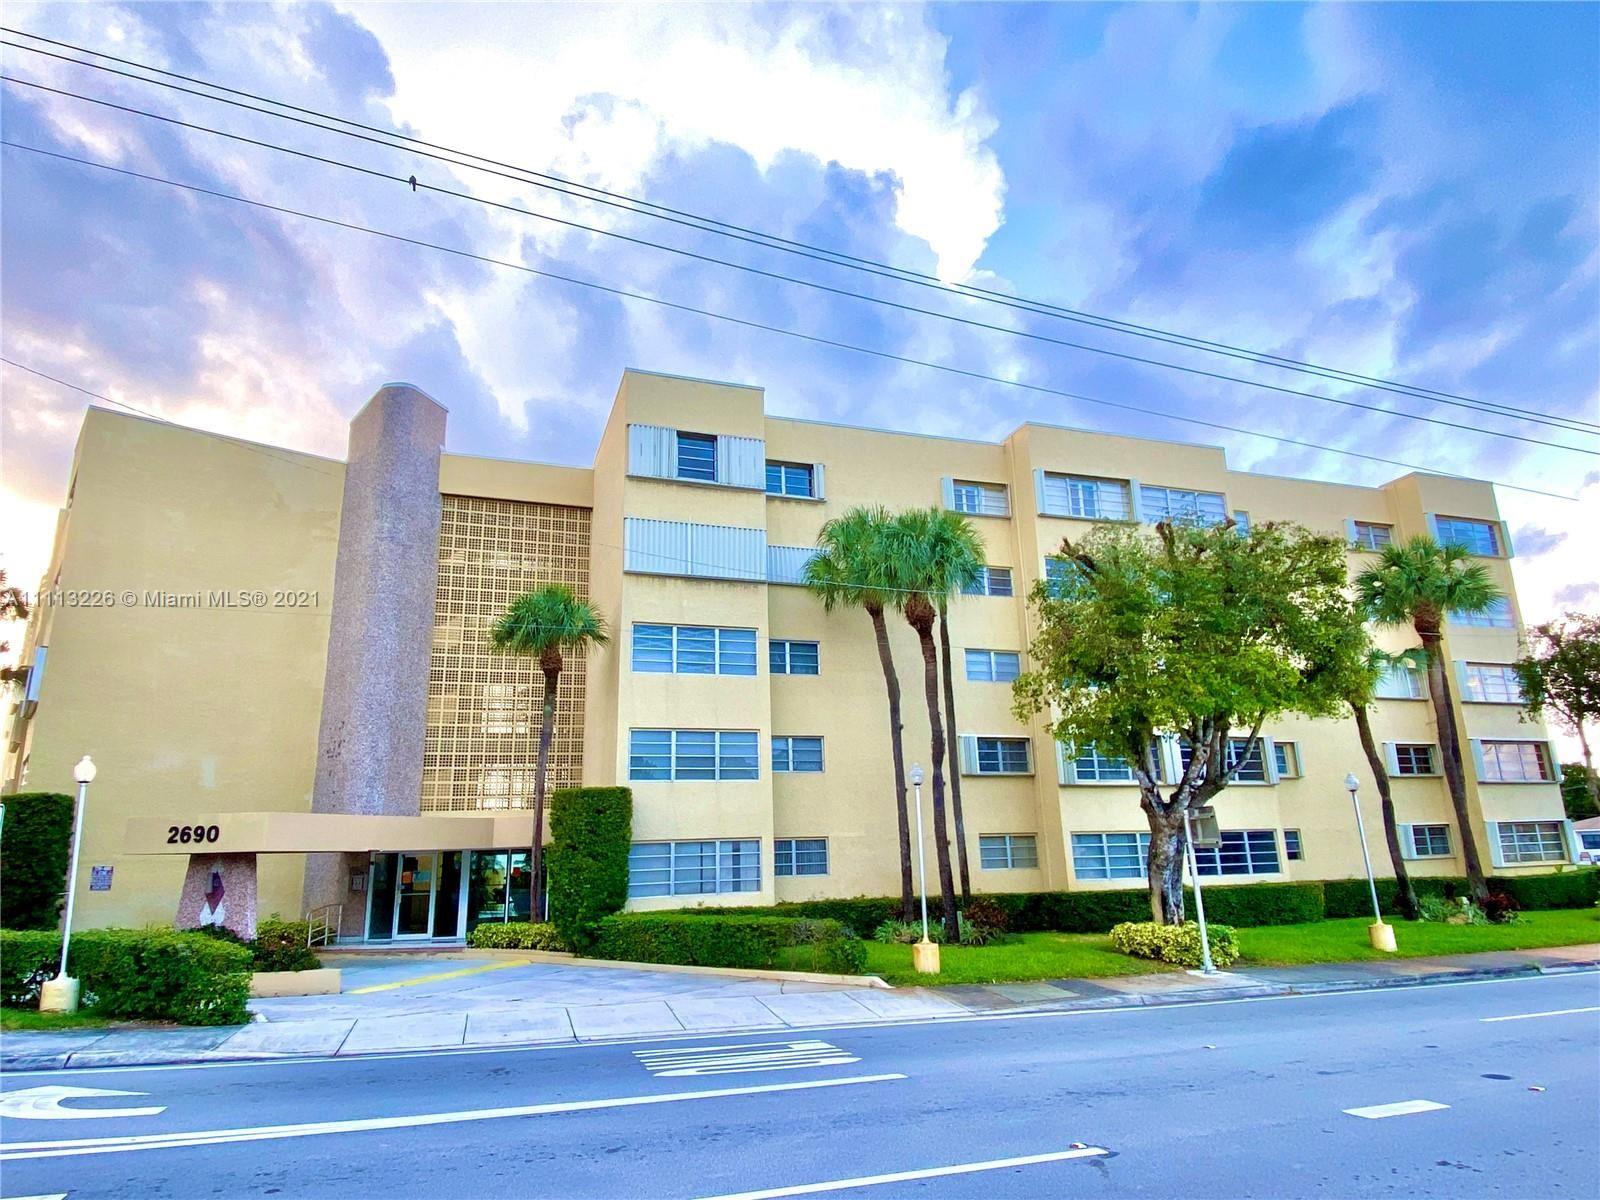 2690 SW 22nd Ave #205, Miami, FL 33133 - #: A11113226